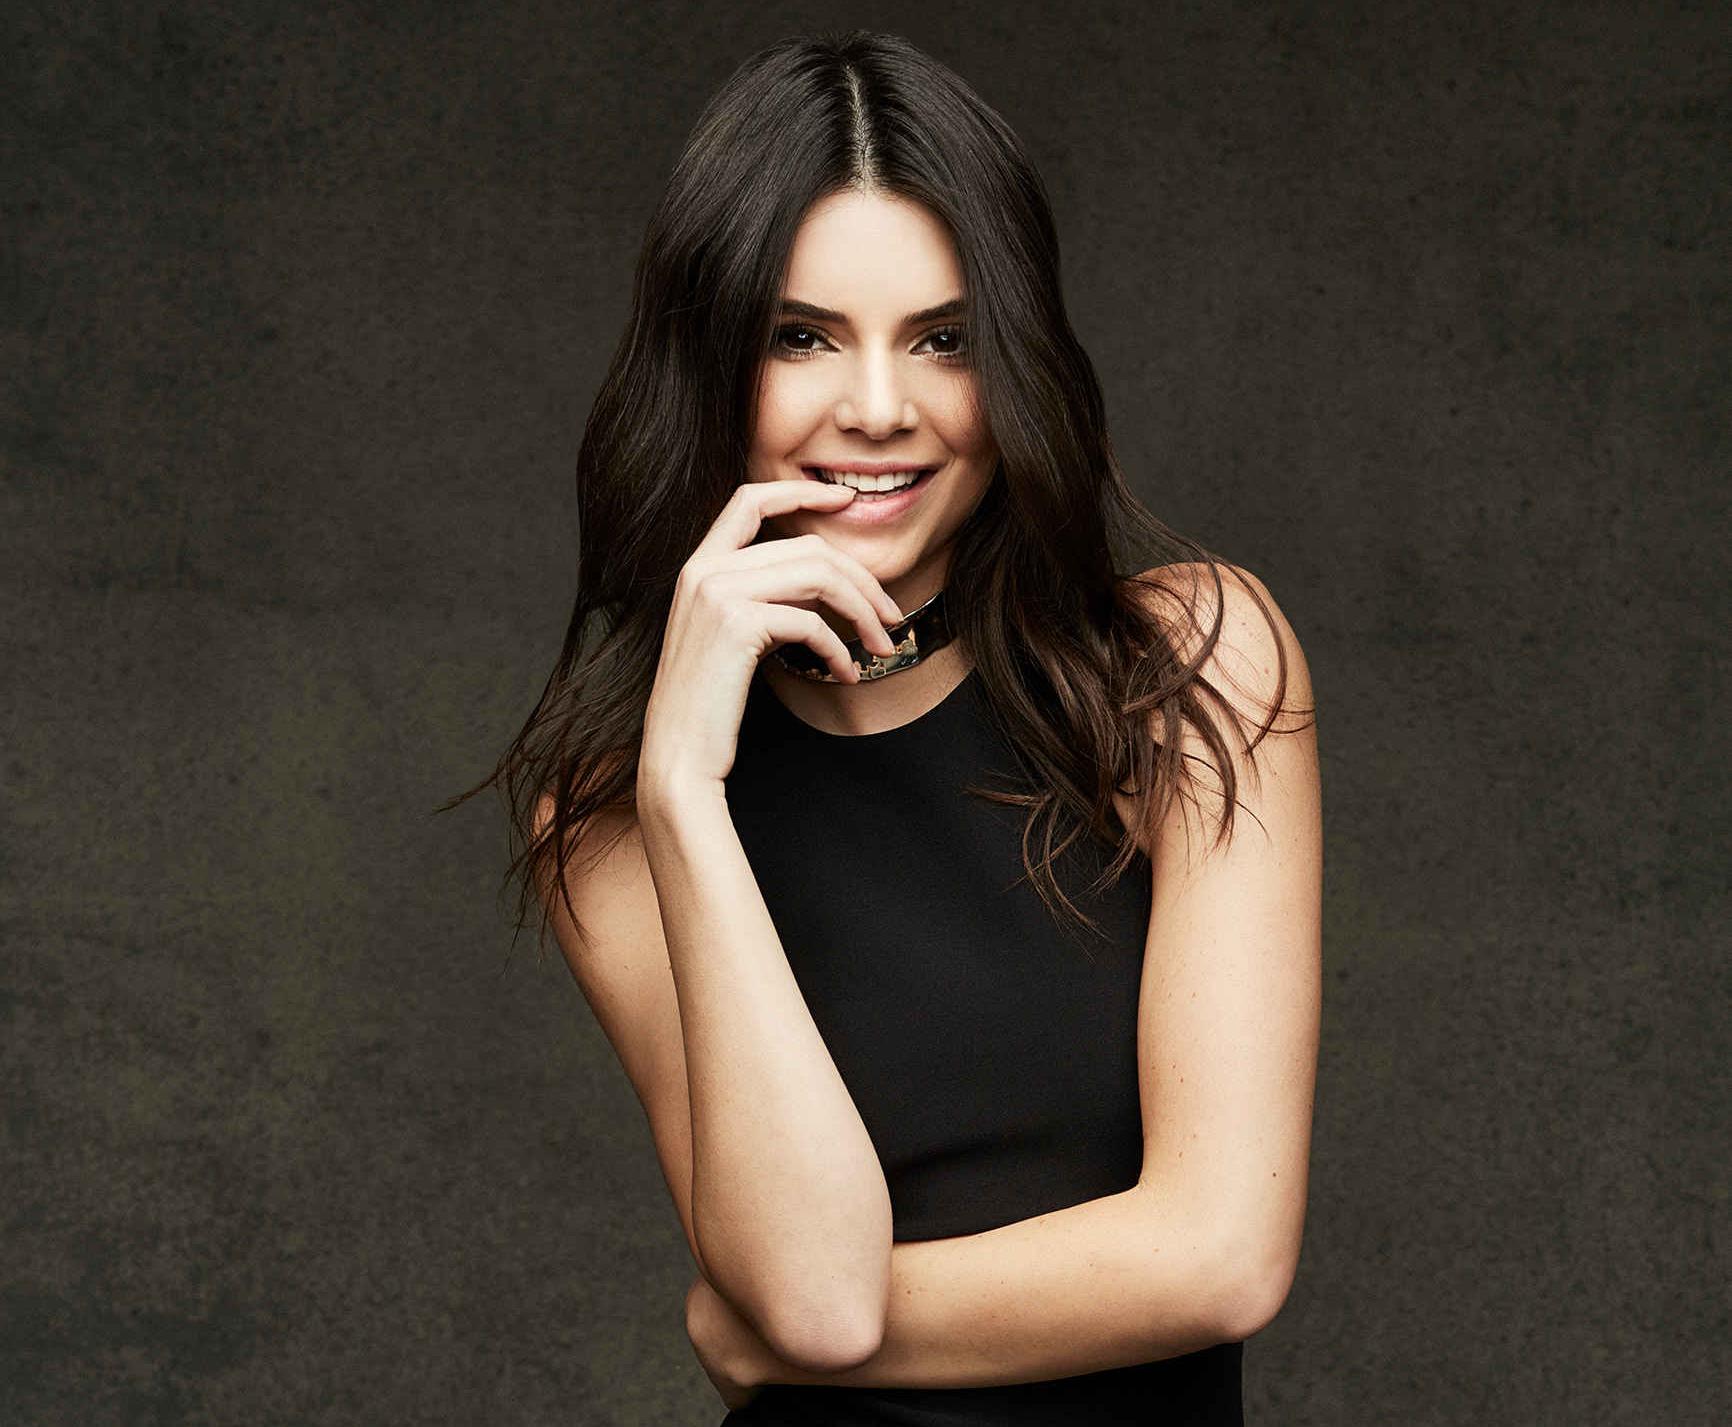 Kendall Jenner Celebrity HD Celebrities 4k Wallpapers Images